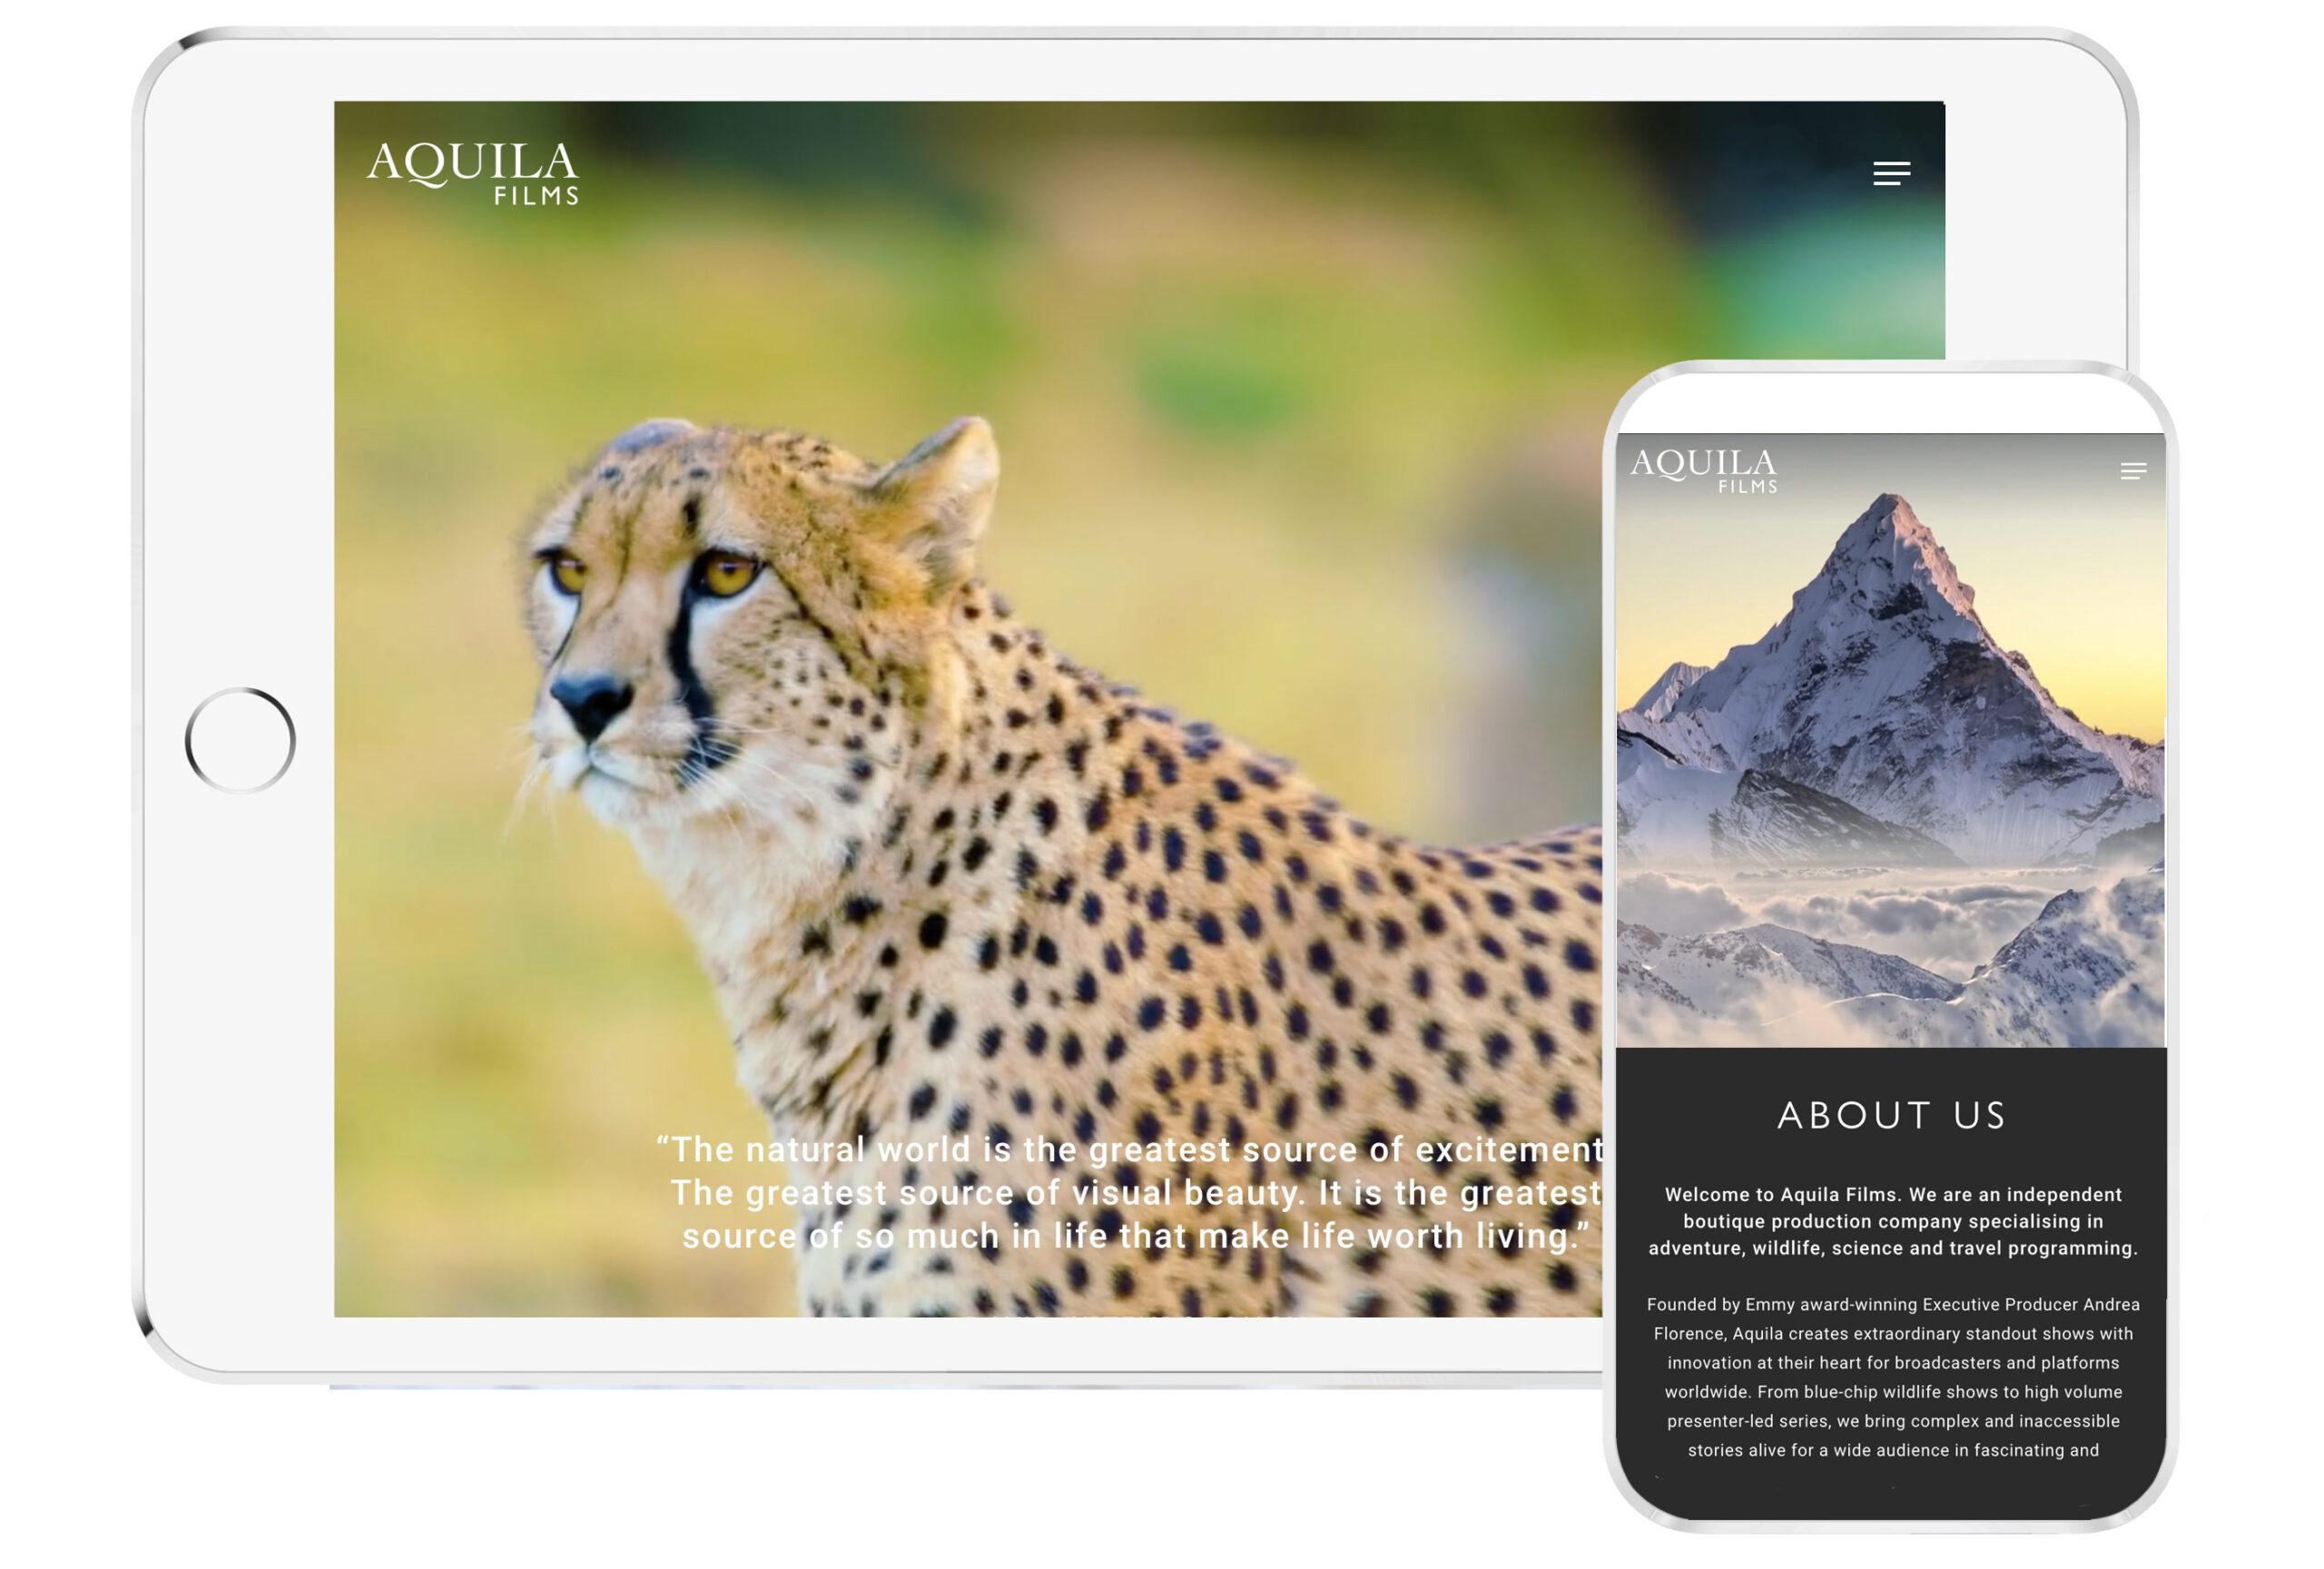 Aquila films web design